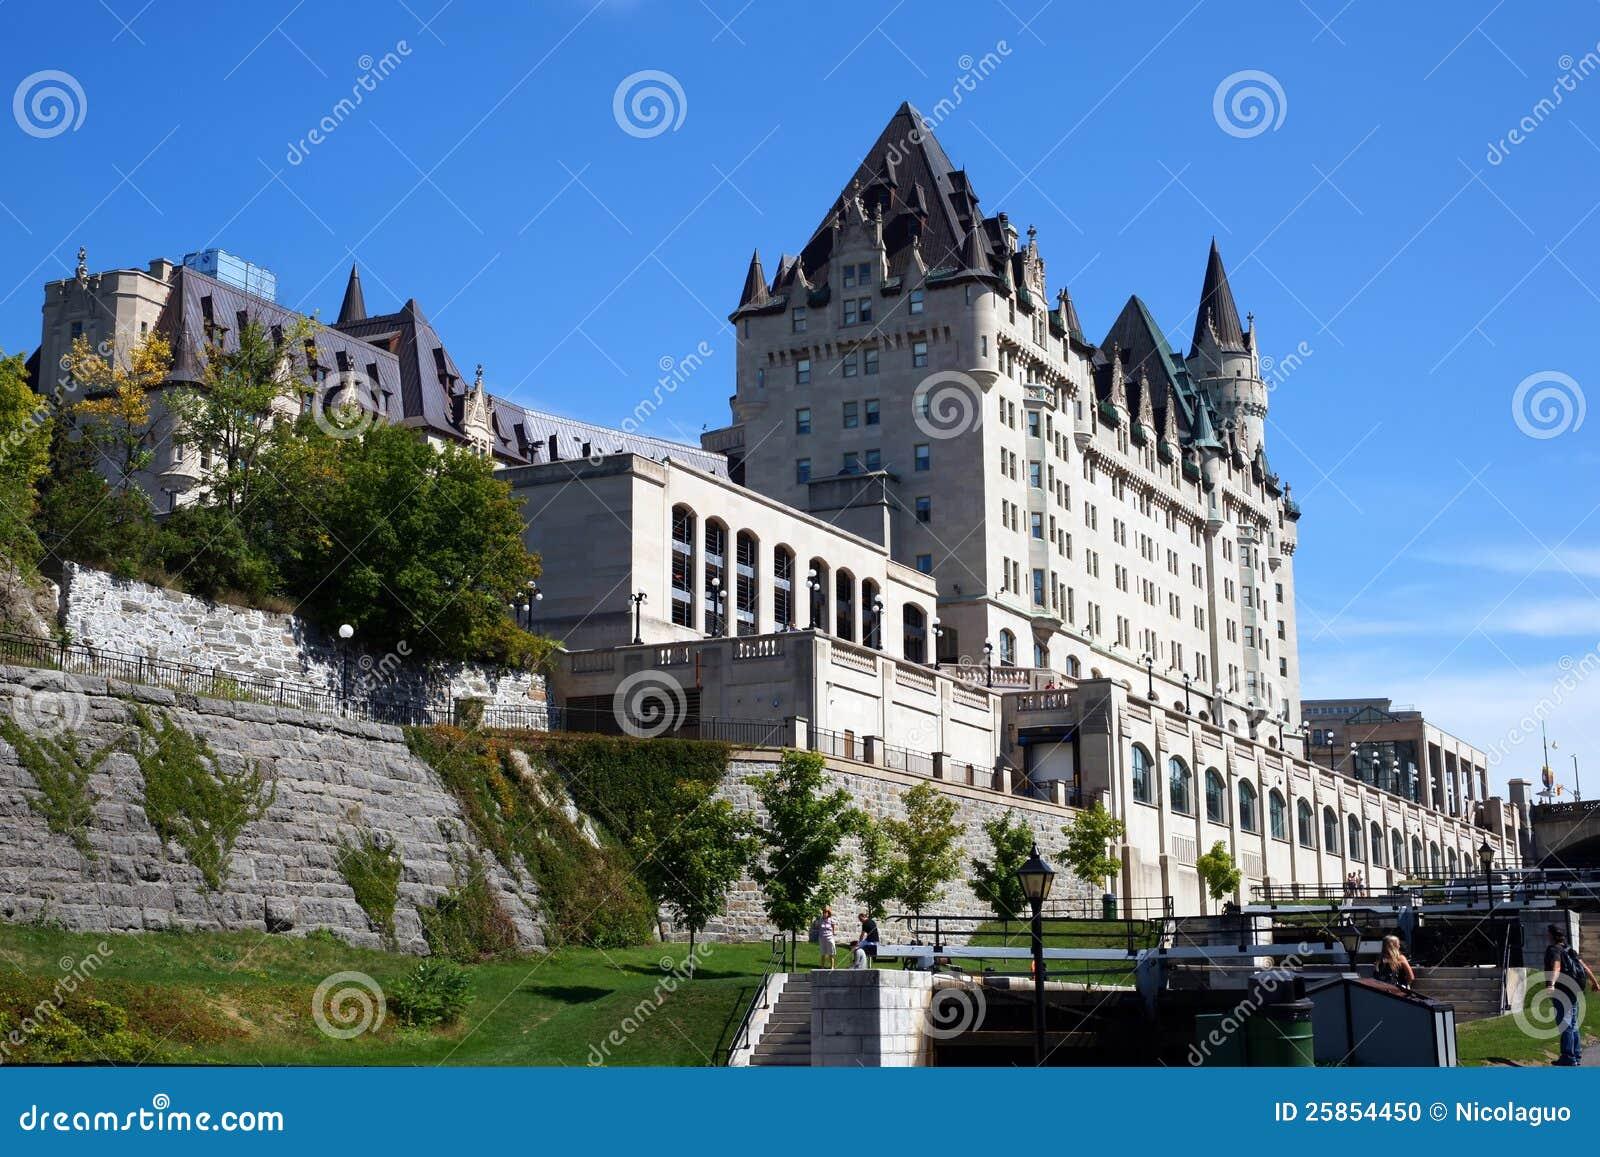 Fairmont ch teau laurier in ottawa canada for Hotel design ottawa